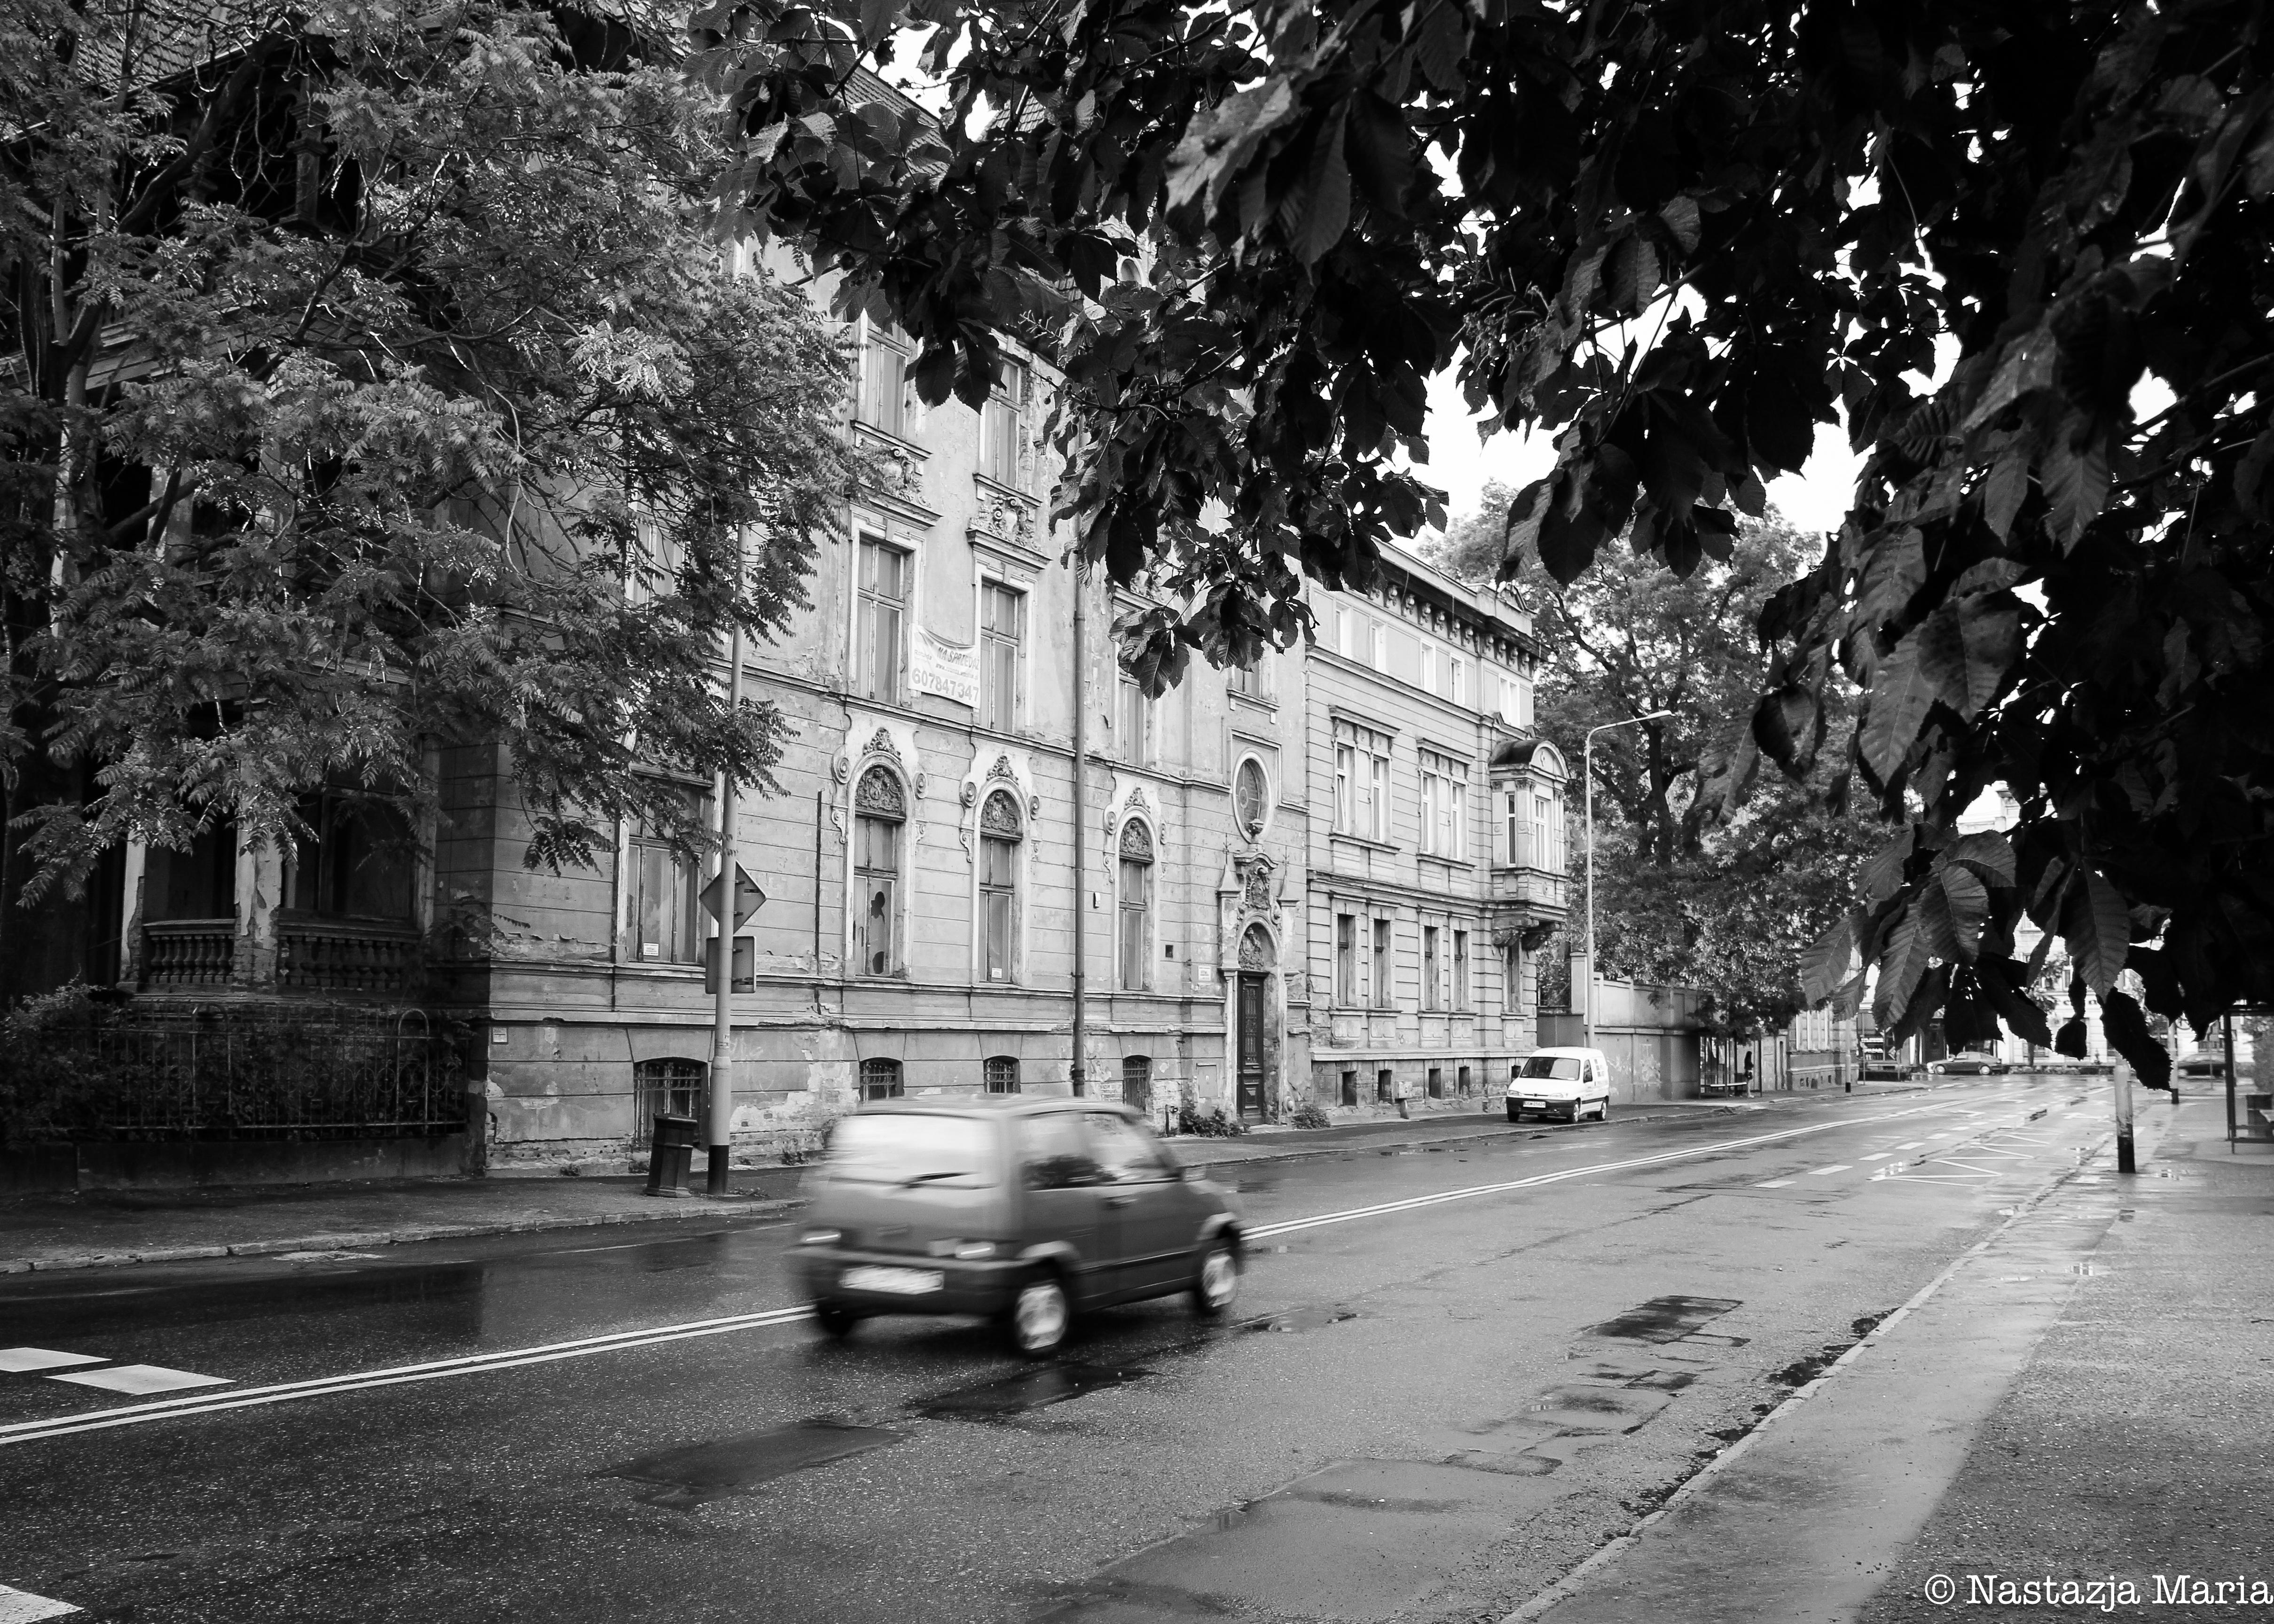 Car and street in Poland, 5 x 7.jpg